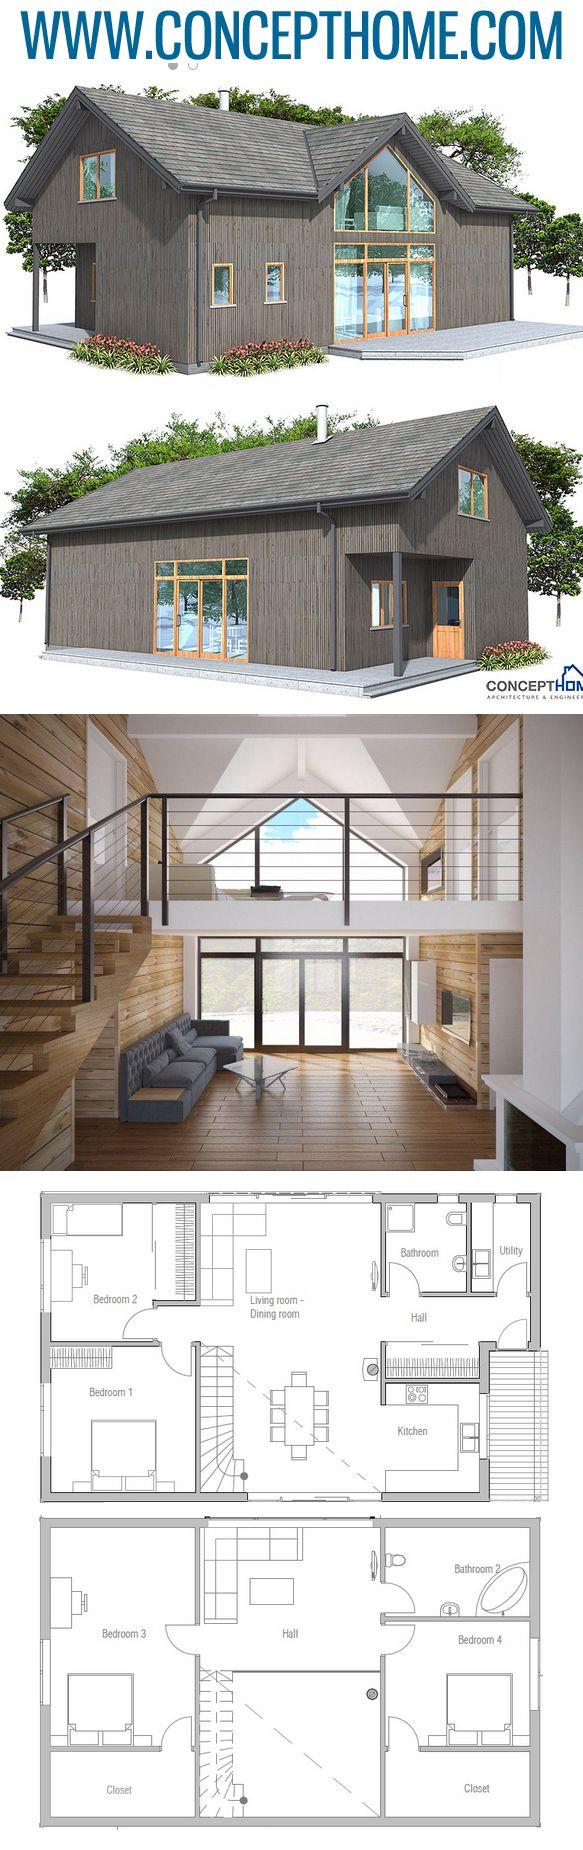 House Plan CH21